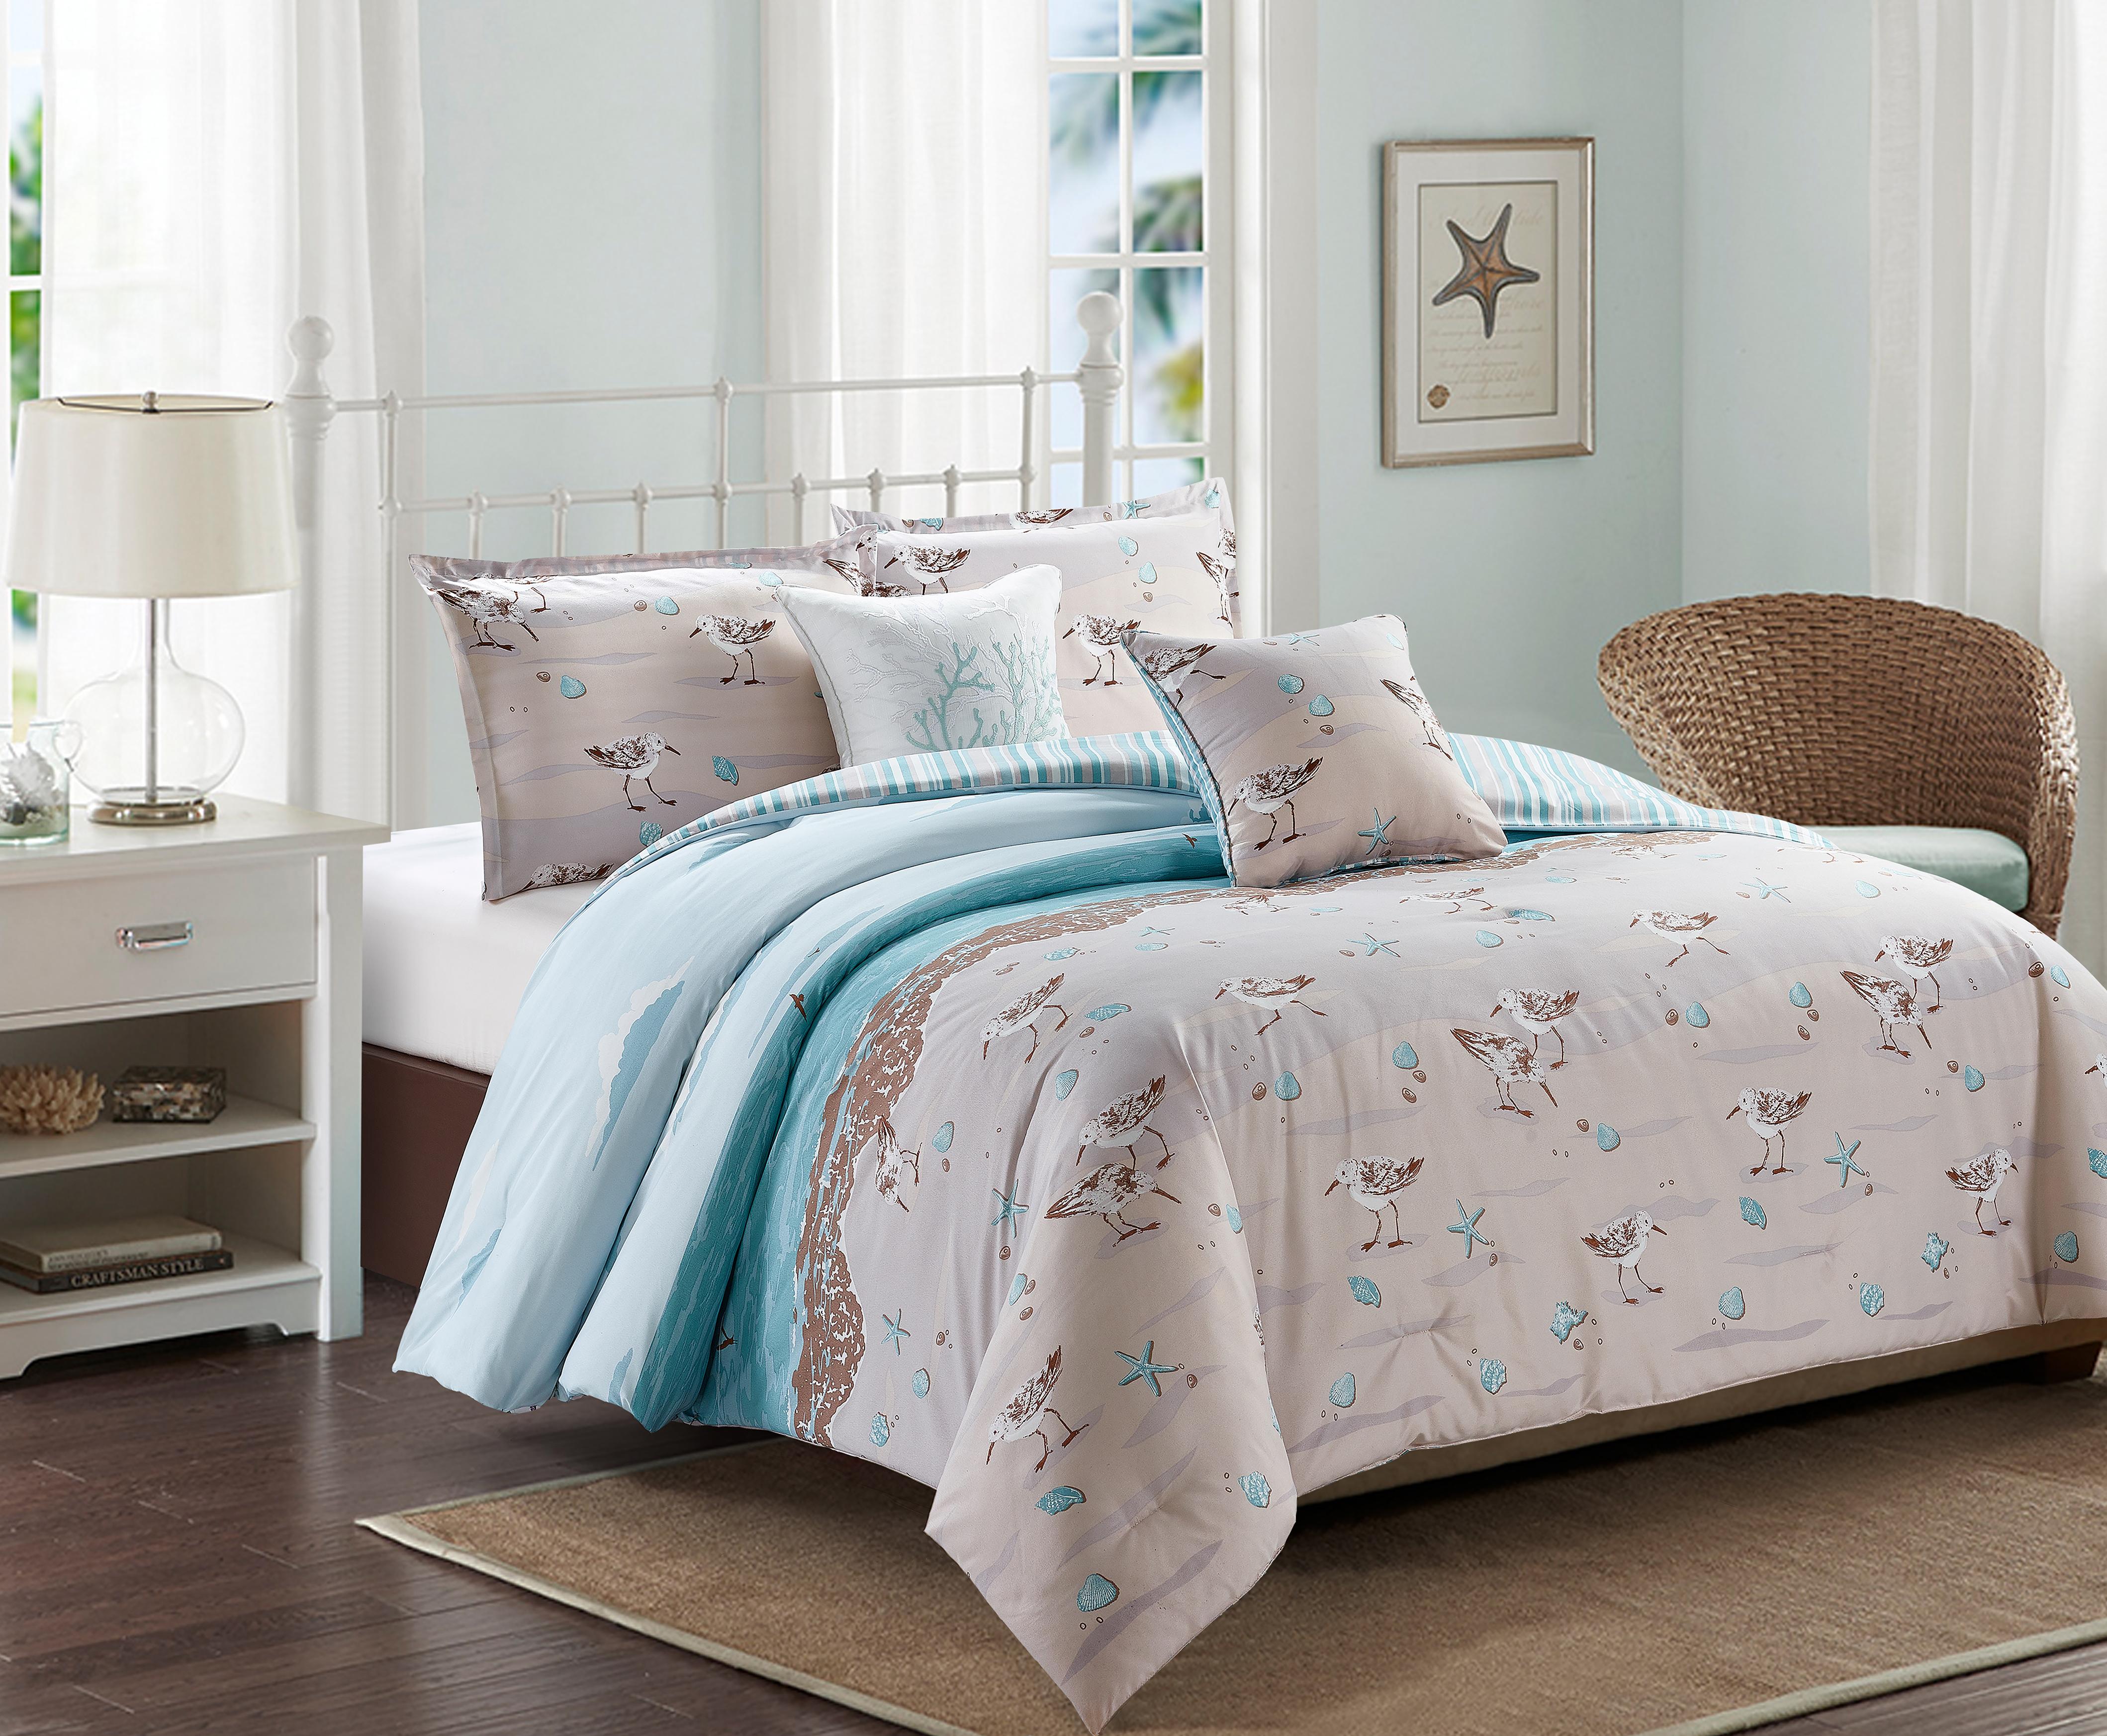 Sandpiper comforter set